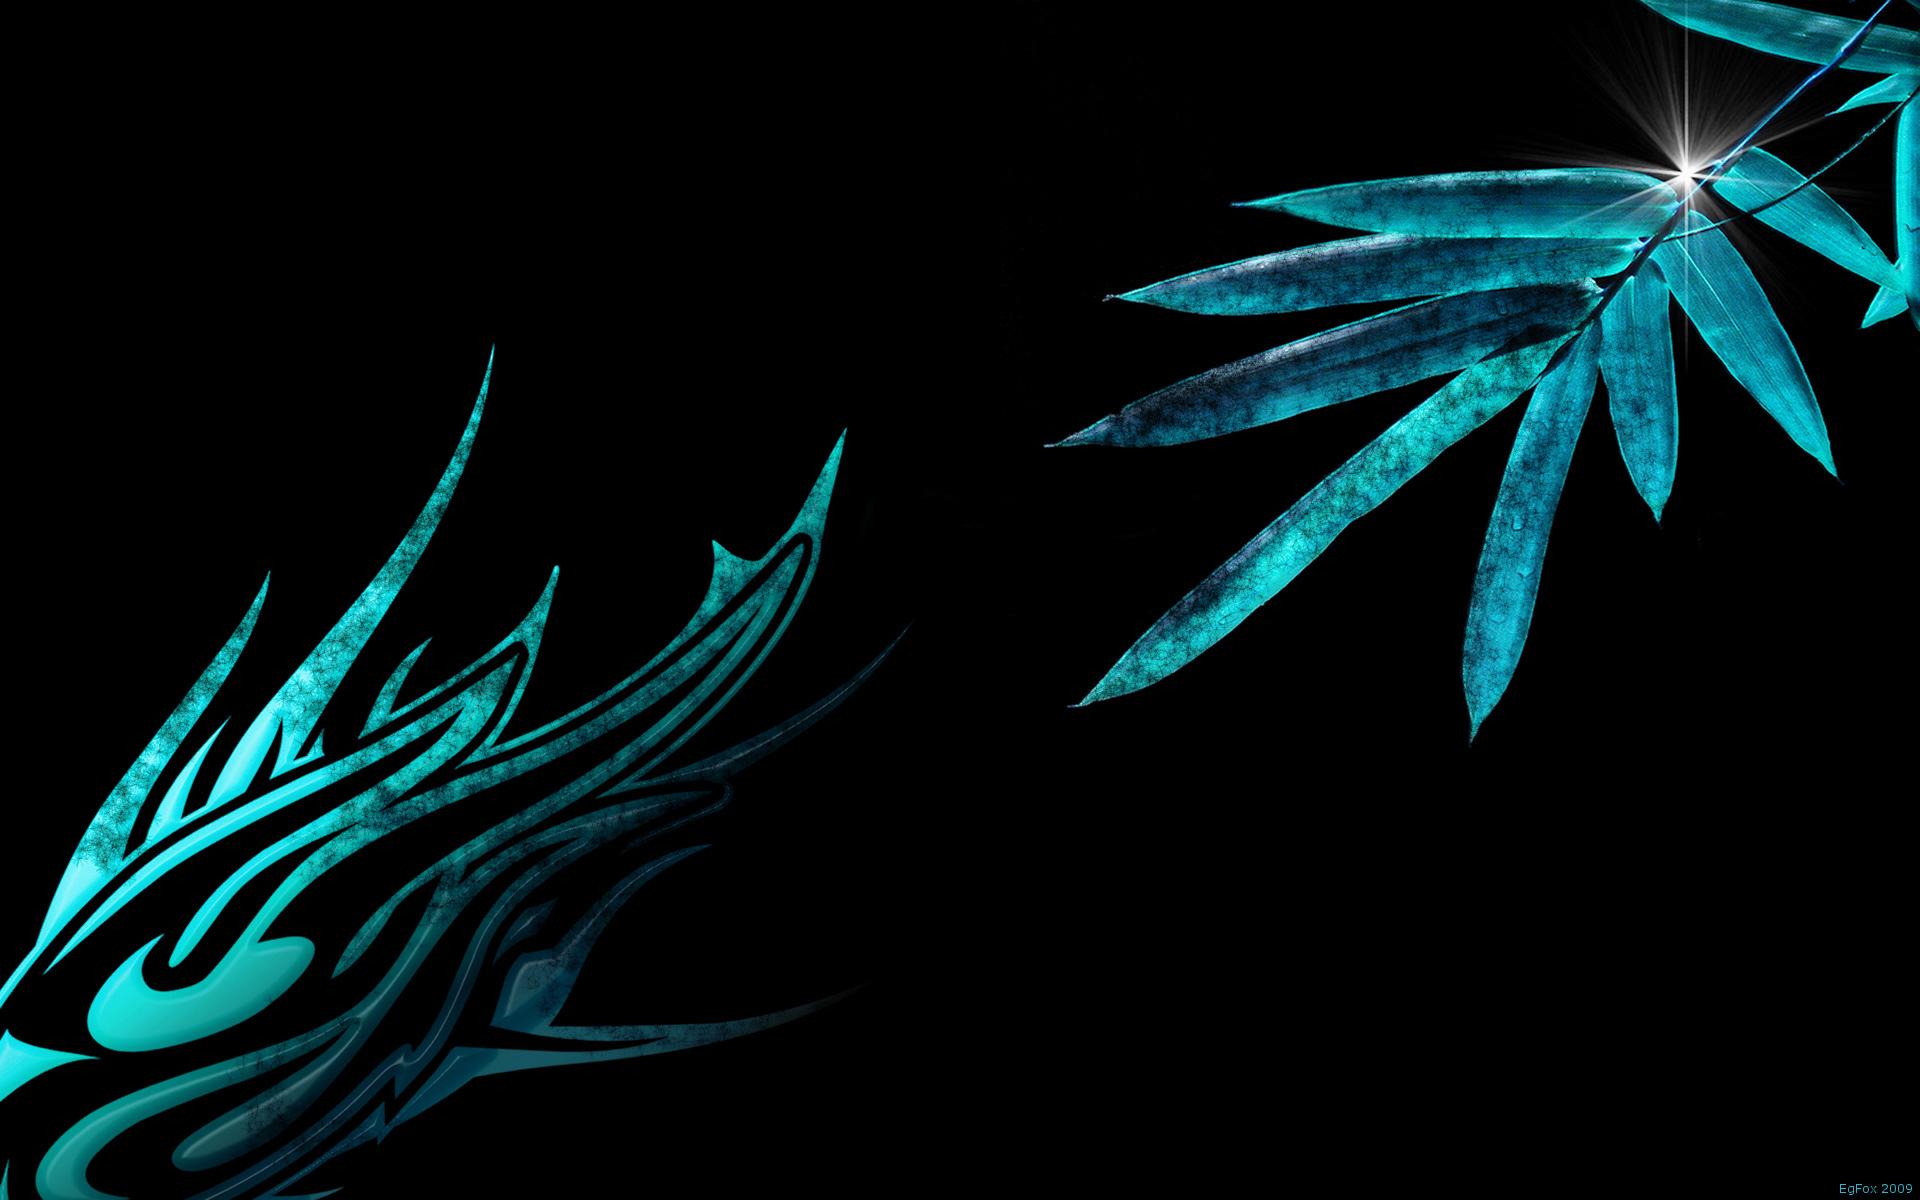 http://fc06.deviantart.net/fs47/f/2009/211/d/7/EgFox_TribalPlants_blue_HD_by_Eg_Art.jpg